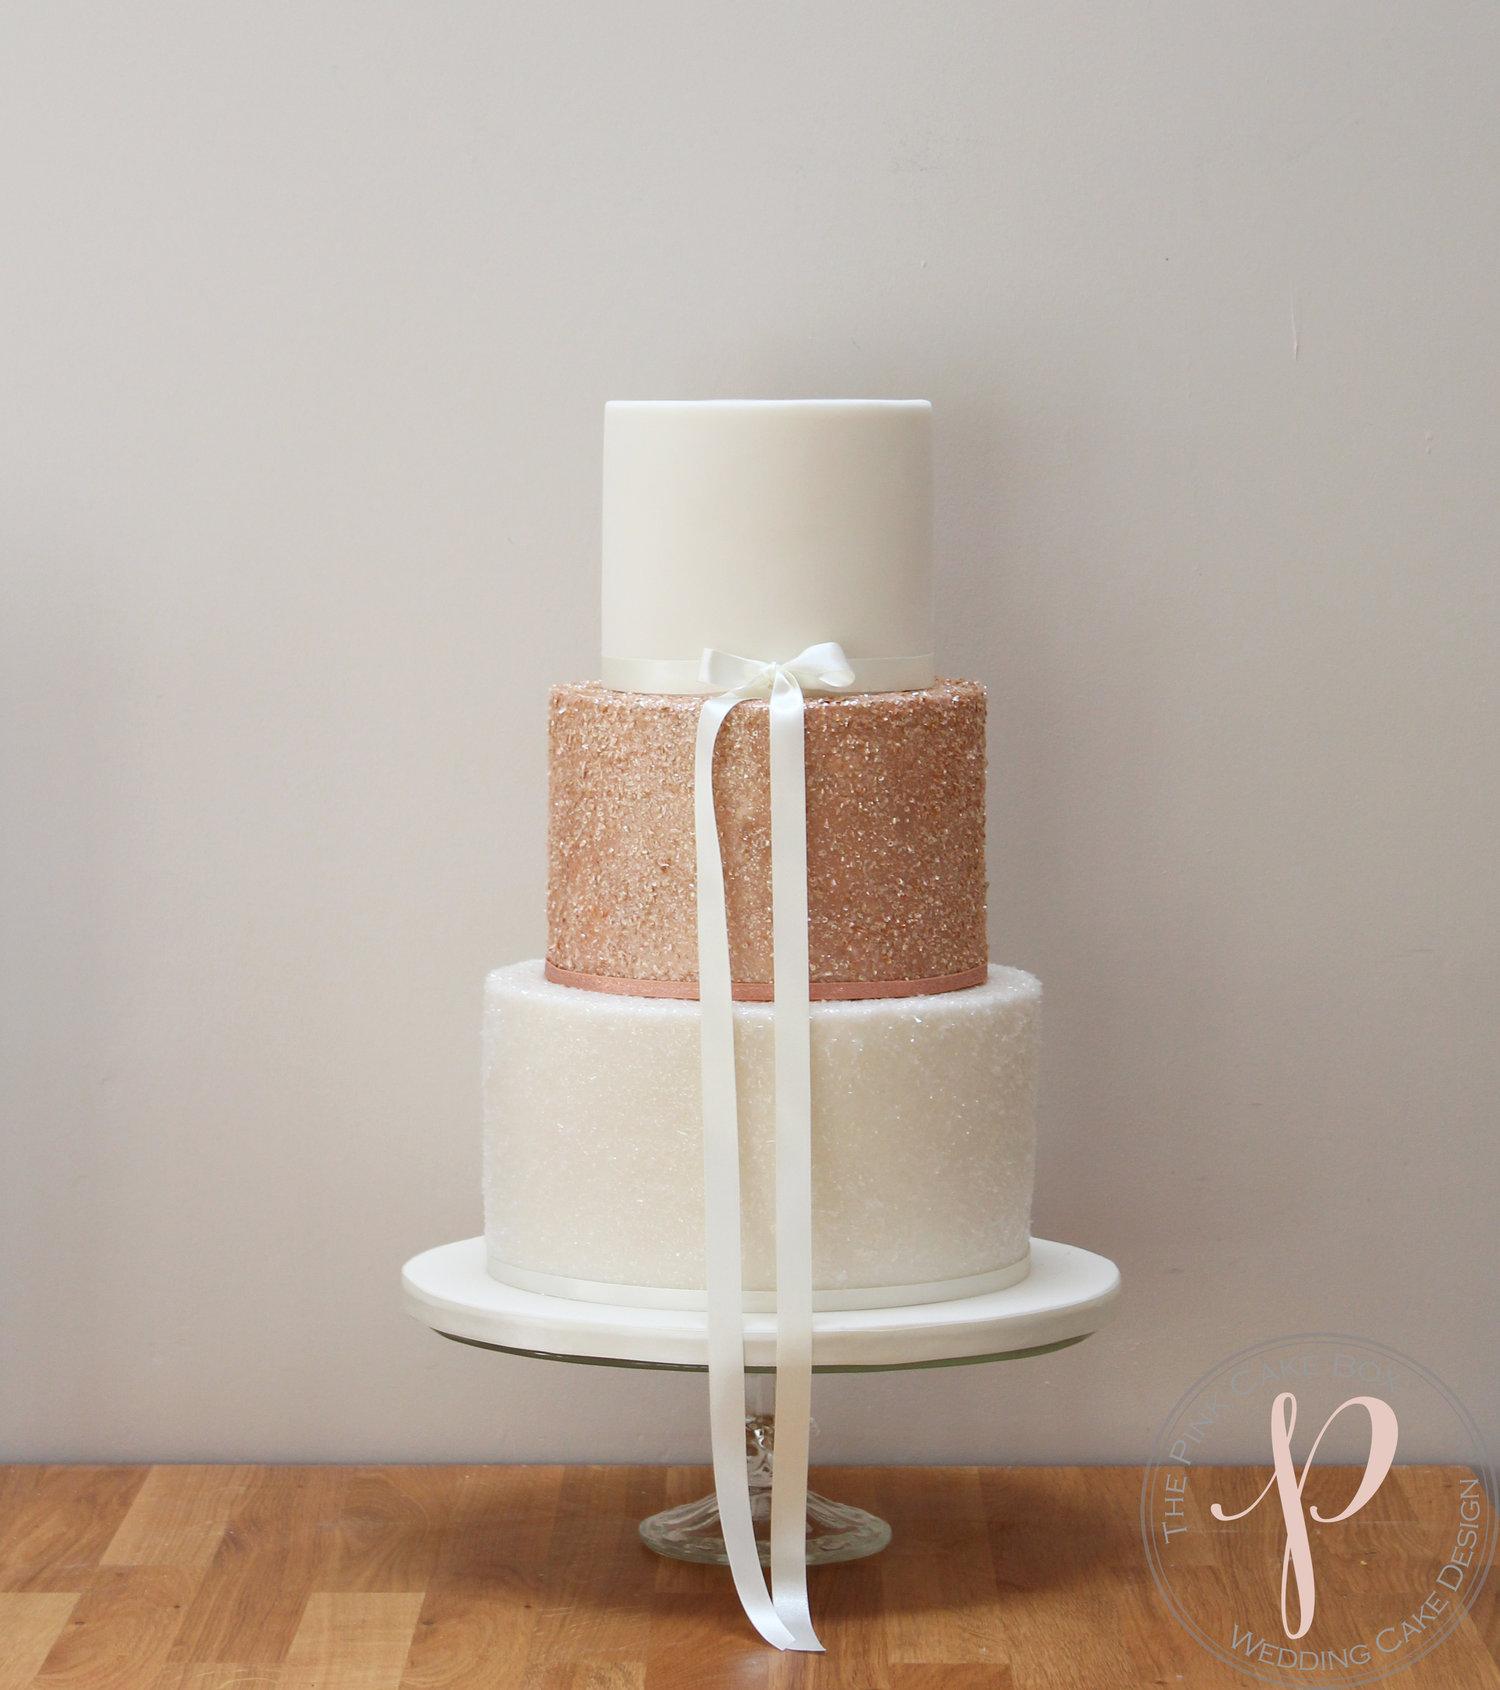 Simple Elegant Rose Gold Wedding Cake For Natalie And Mike At The Farmhouse Mackworth The Pink Cake Box Wedding Cake Design